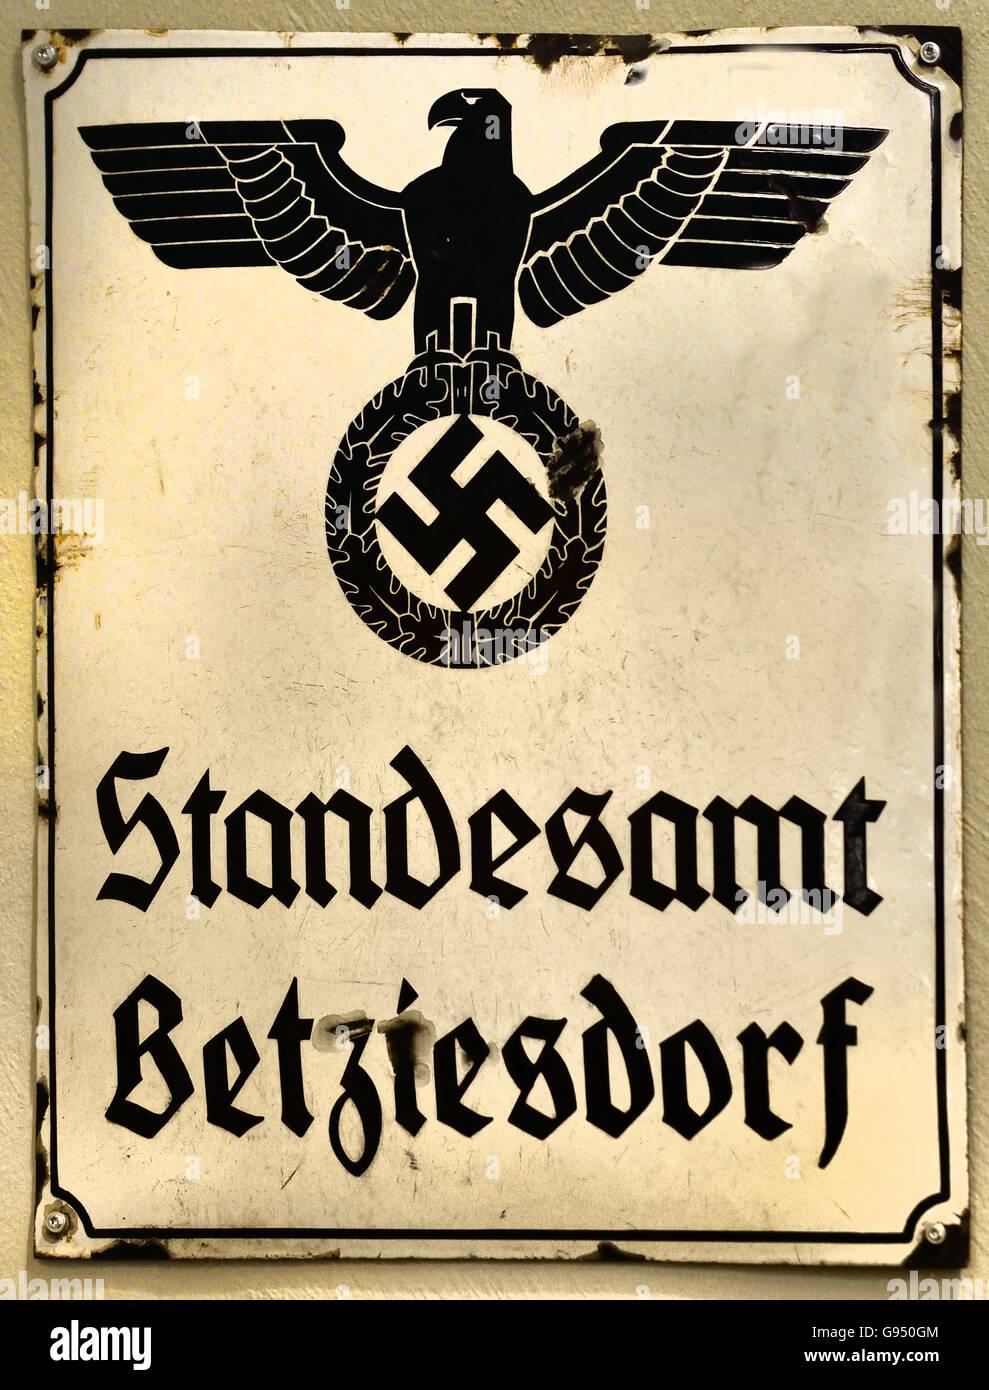 Standesamt Betzdorf - Registry office Betzdorf  Sign Berlin Nazi Germany Swastika - Stock Image